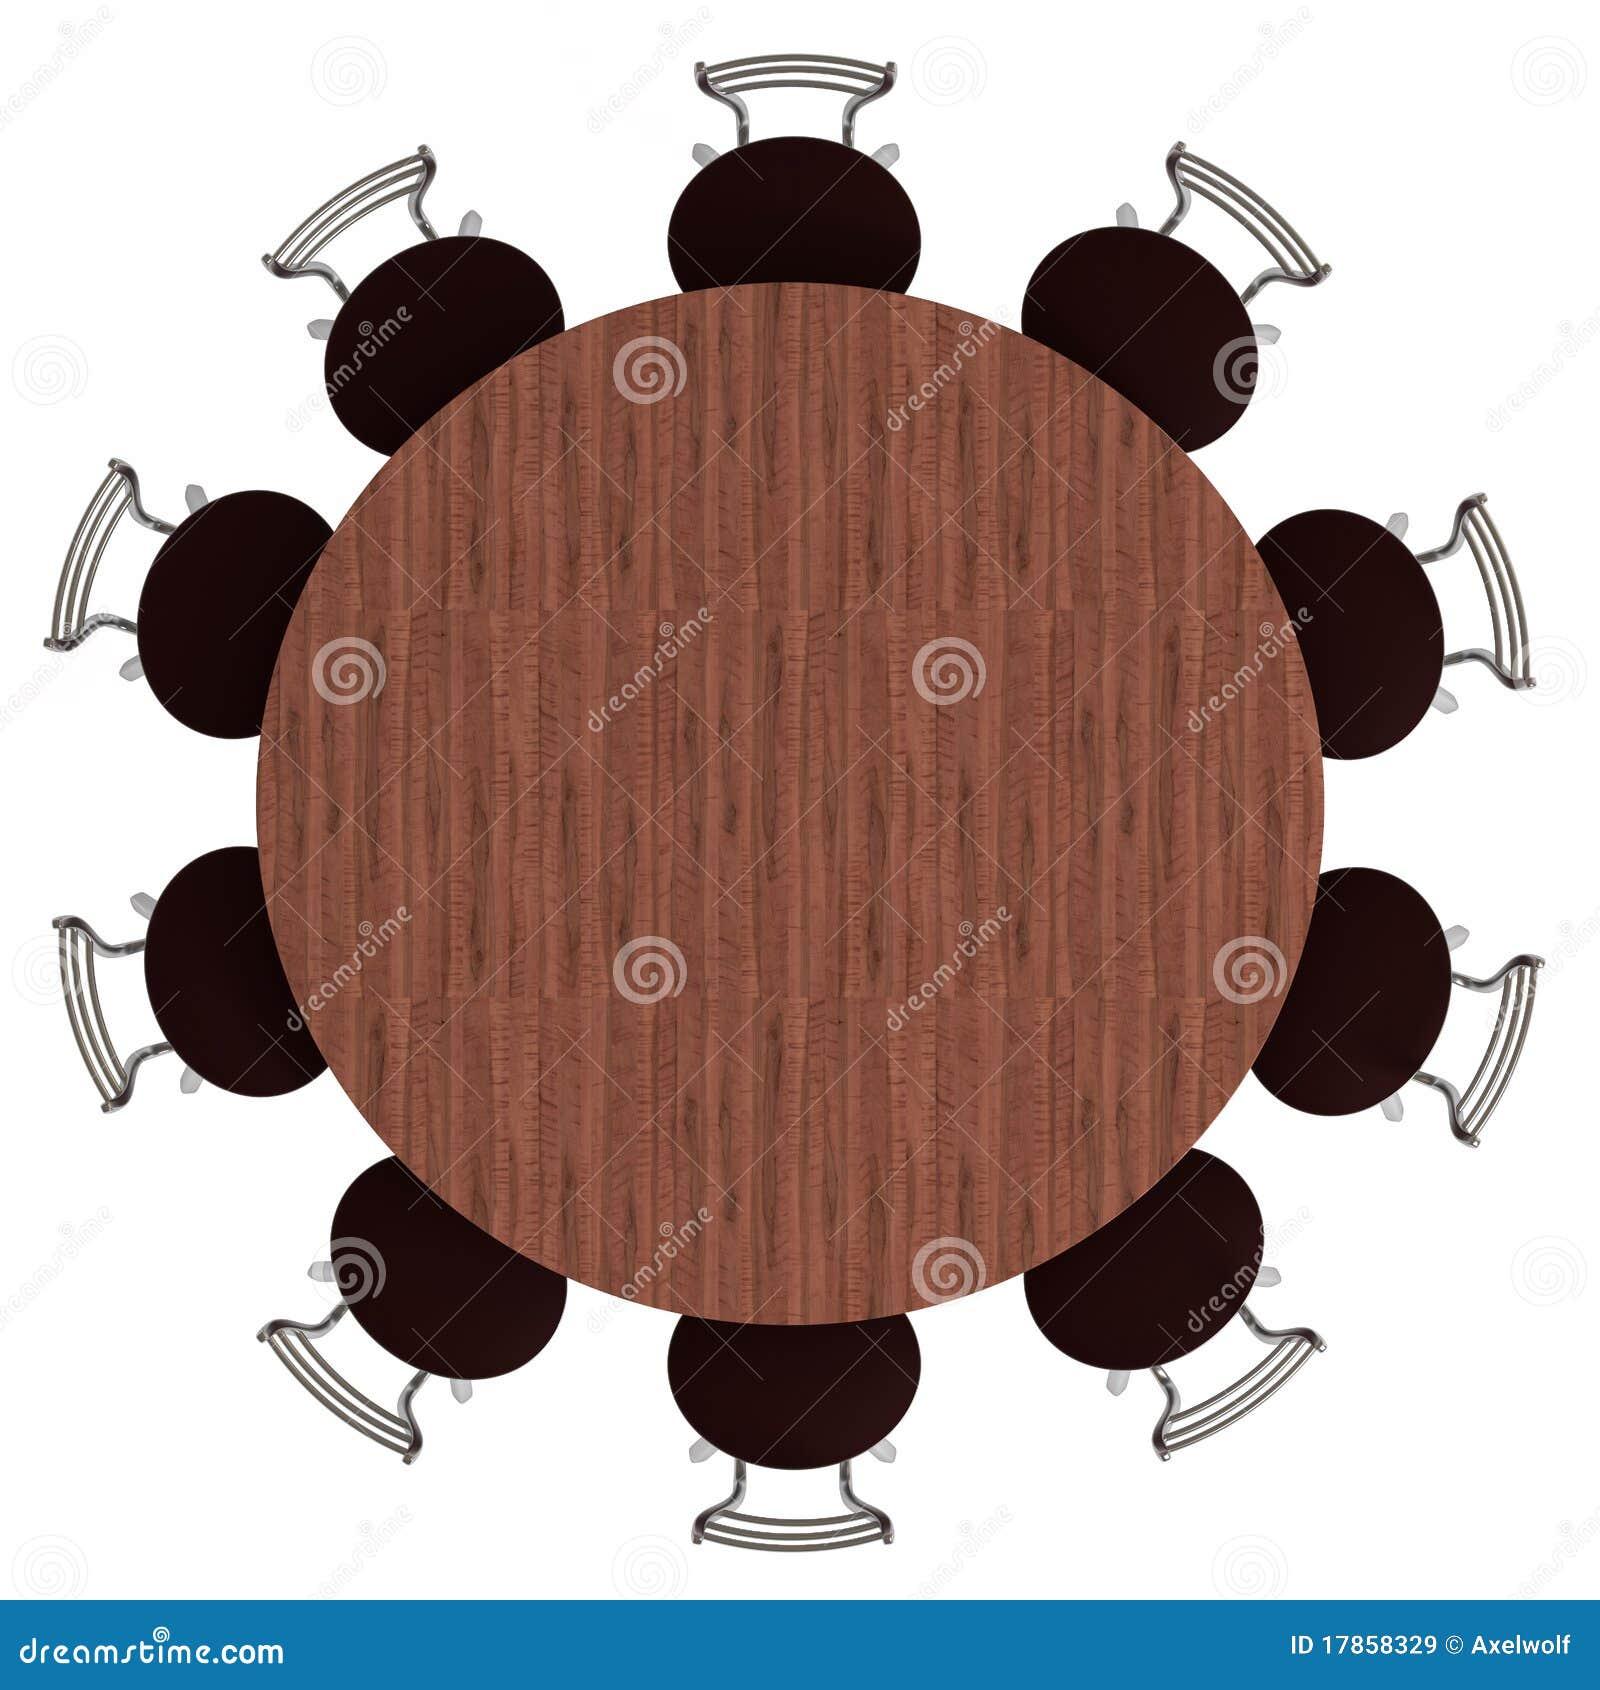 Mesa Redonda E Cadeiras Vista Superior Isolada  : mesa redonda e cadeiras vista superior isolada 17858329 from pt.dreamstime.com size 1300 x 1390 jpeg 151kB